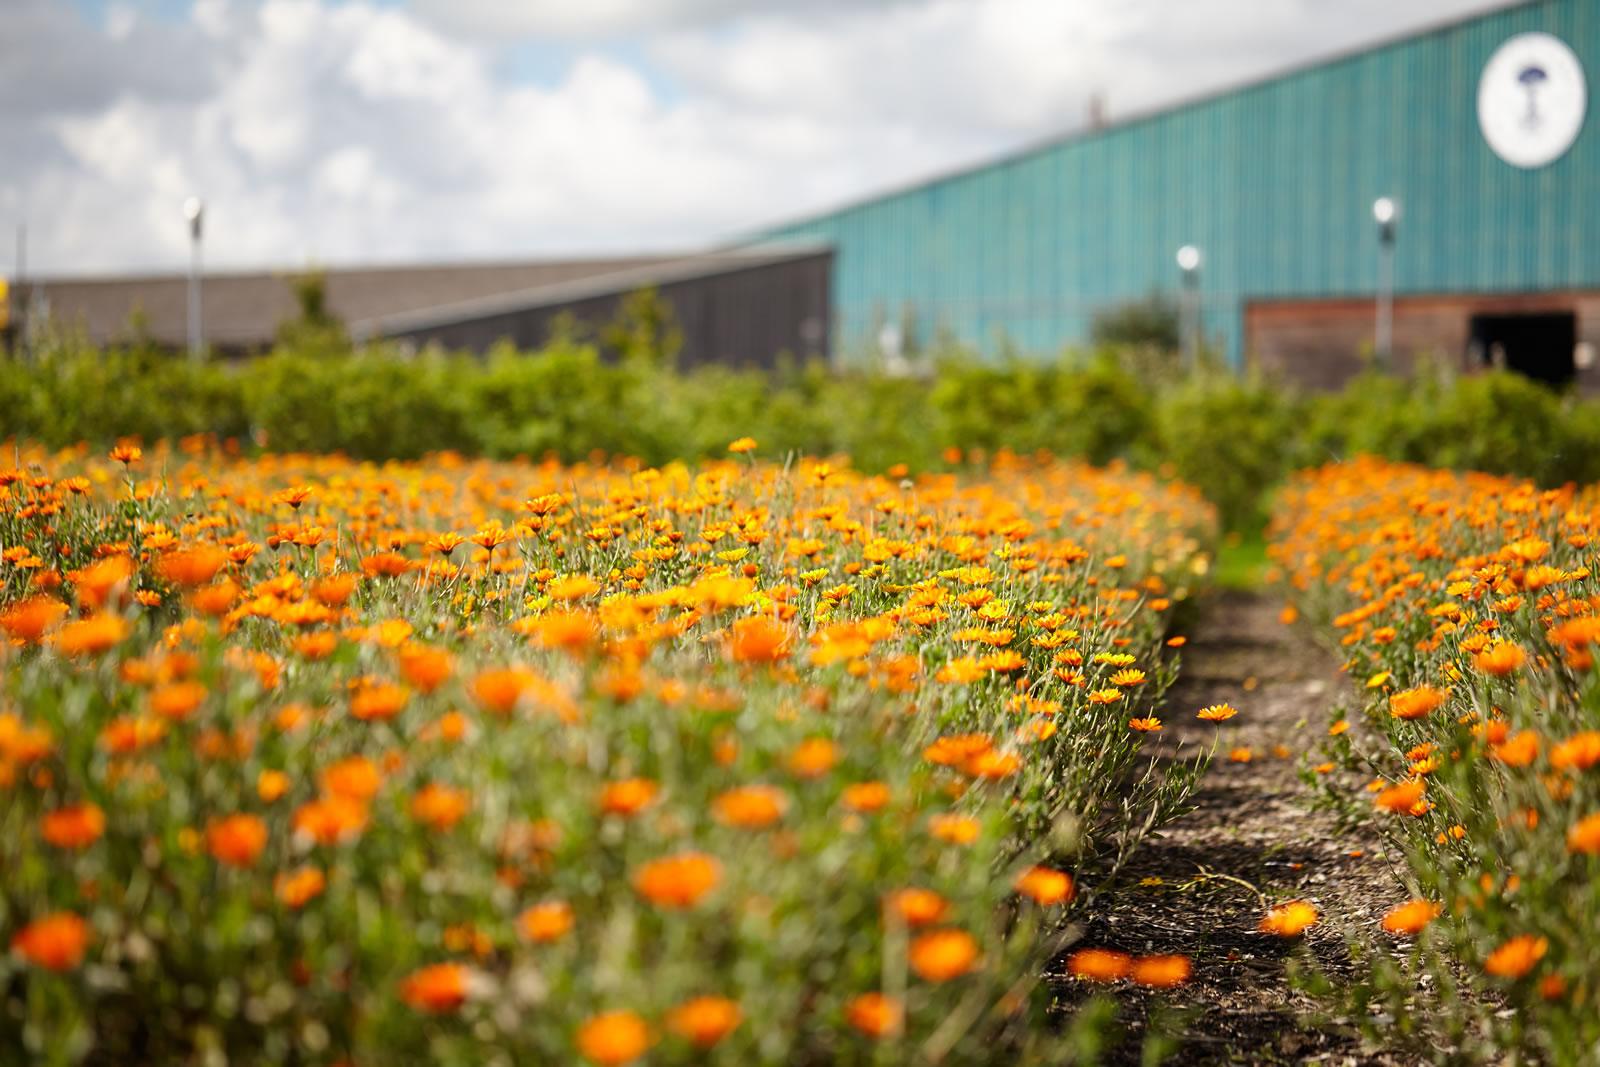 Neals's Yard Remedies HQ, Peacemarsh, Dorset